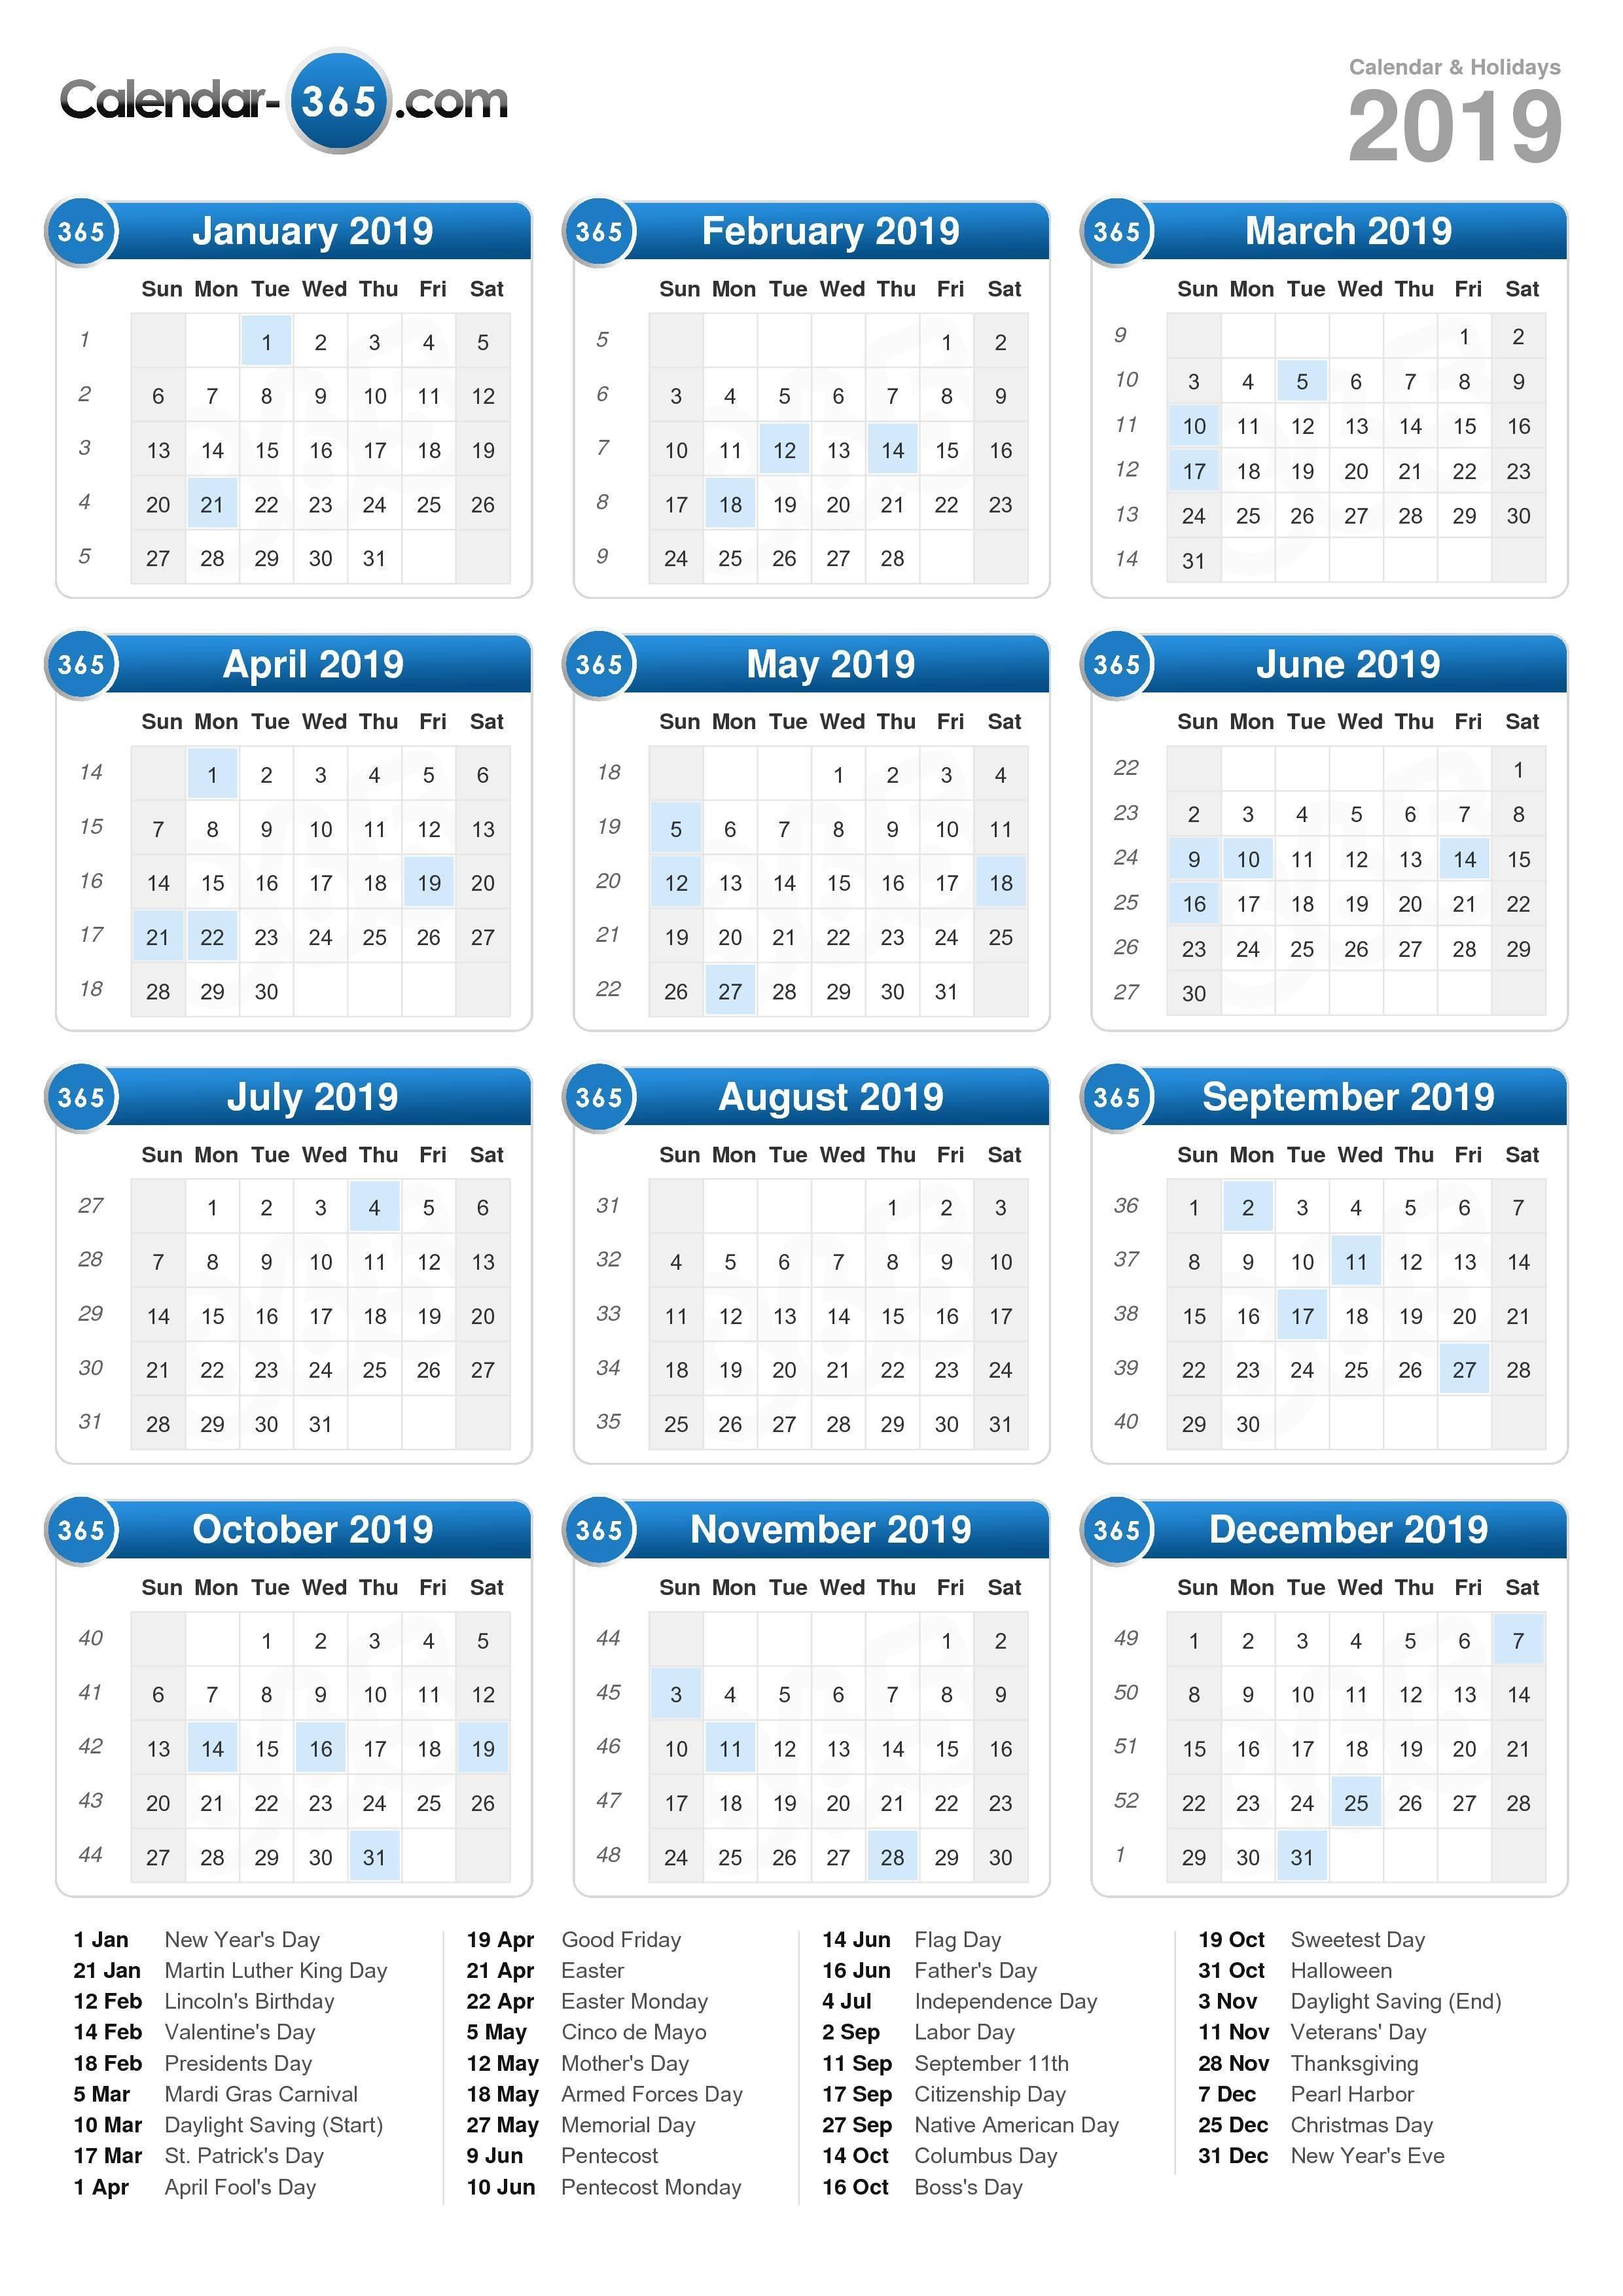 2019 Calendar Calendar 2019 All Holidays